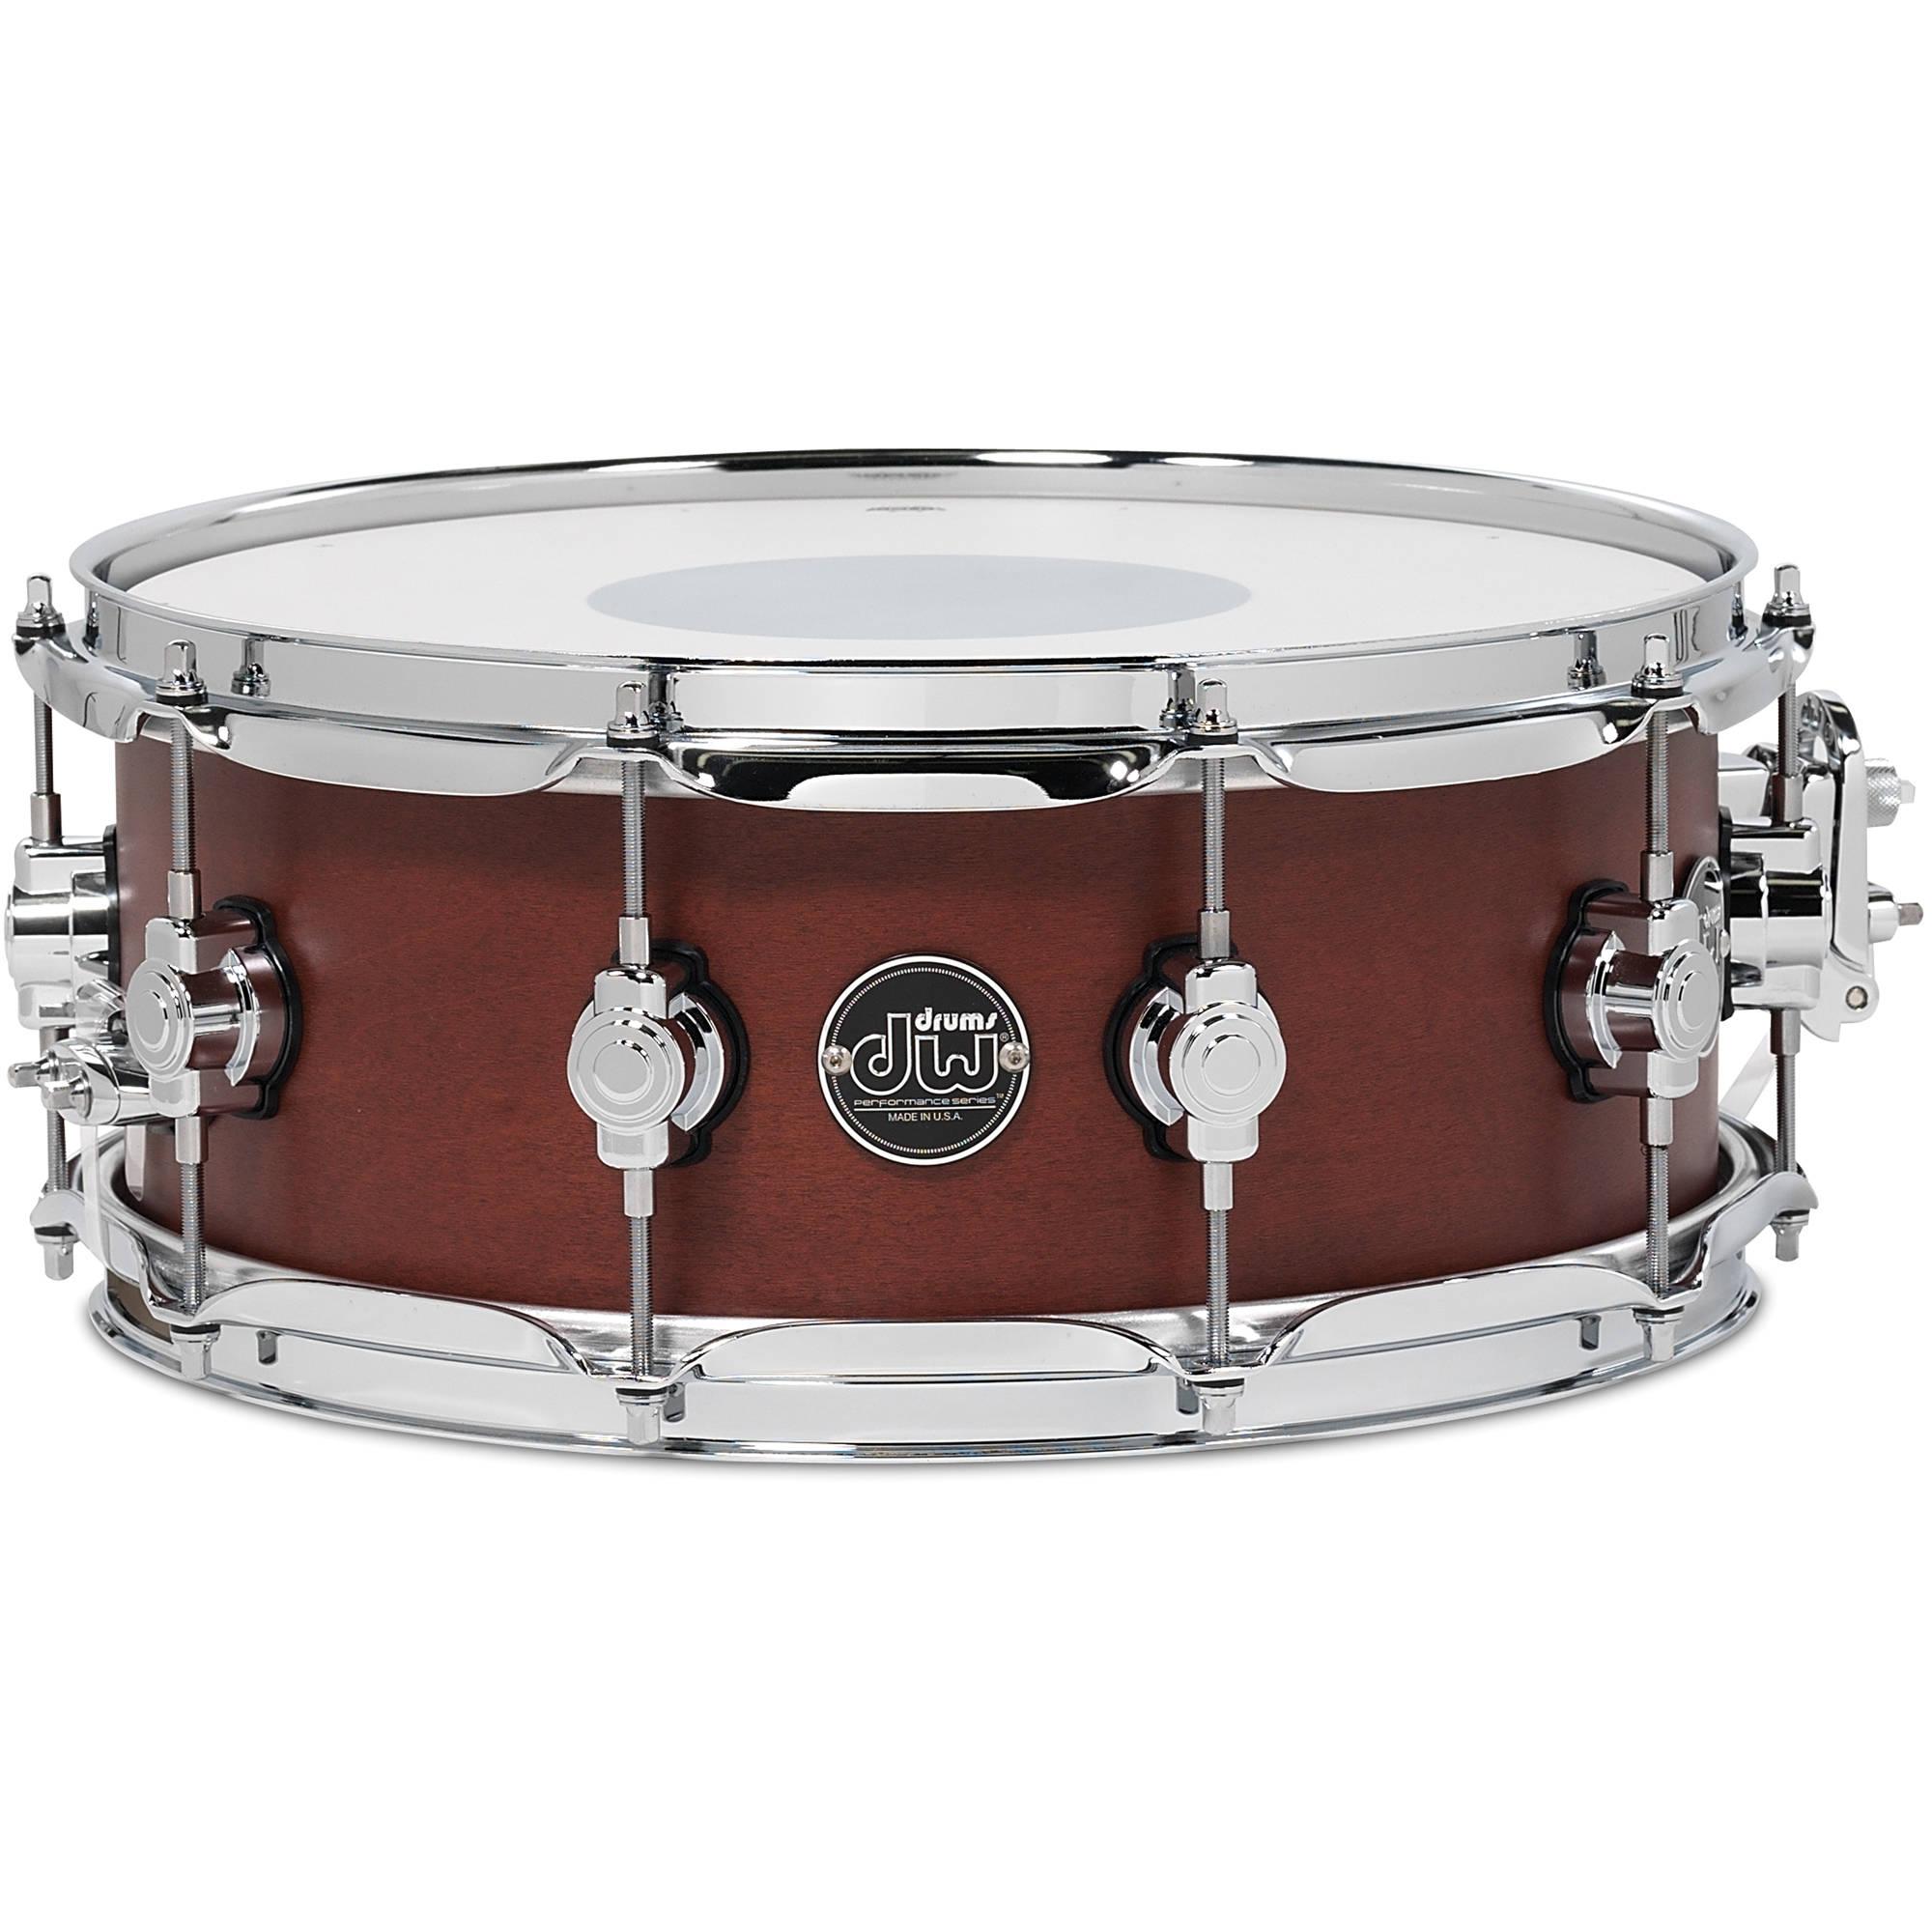 dw drums performance series 5 5 x 14 snare. Black Bedroom Furniture Sets. Home Design Ideas